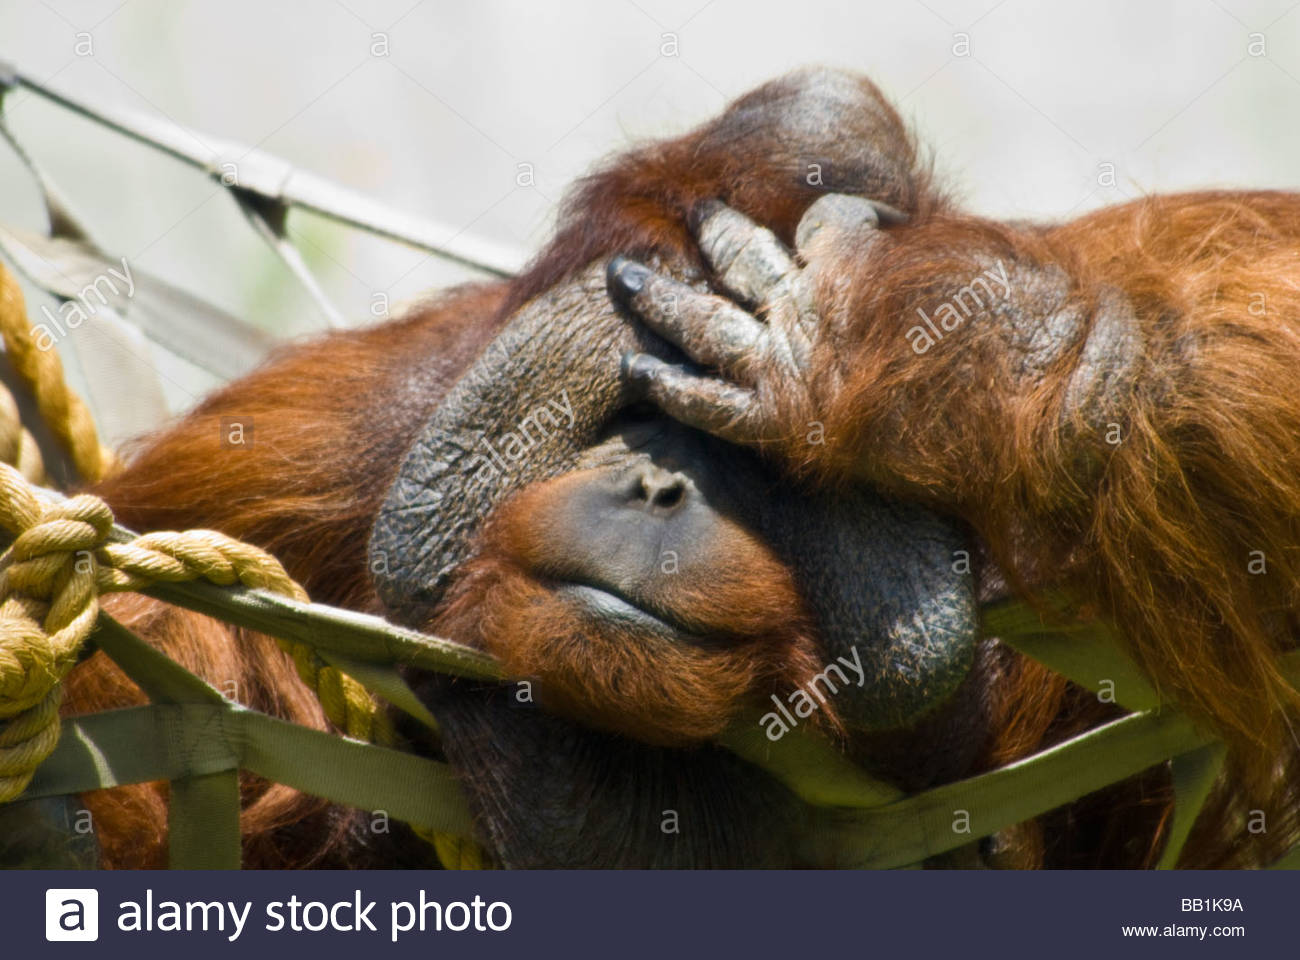 Orangutan di Sumatra tenendo la sua testa, pongo Pygmaeus, Zoo di Denver, Colorado, STATI UNITI D'AMERICA Immagini Stock